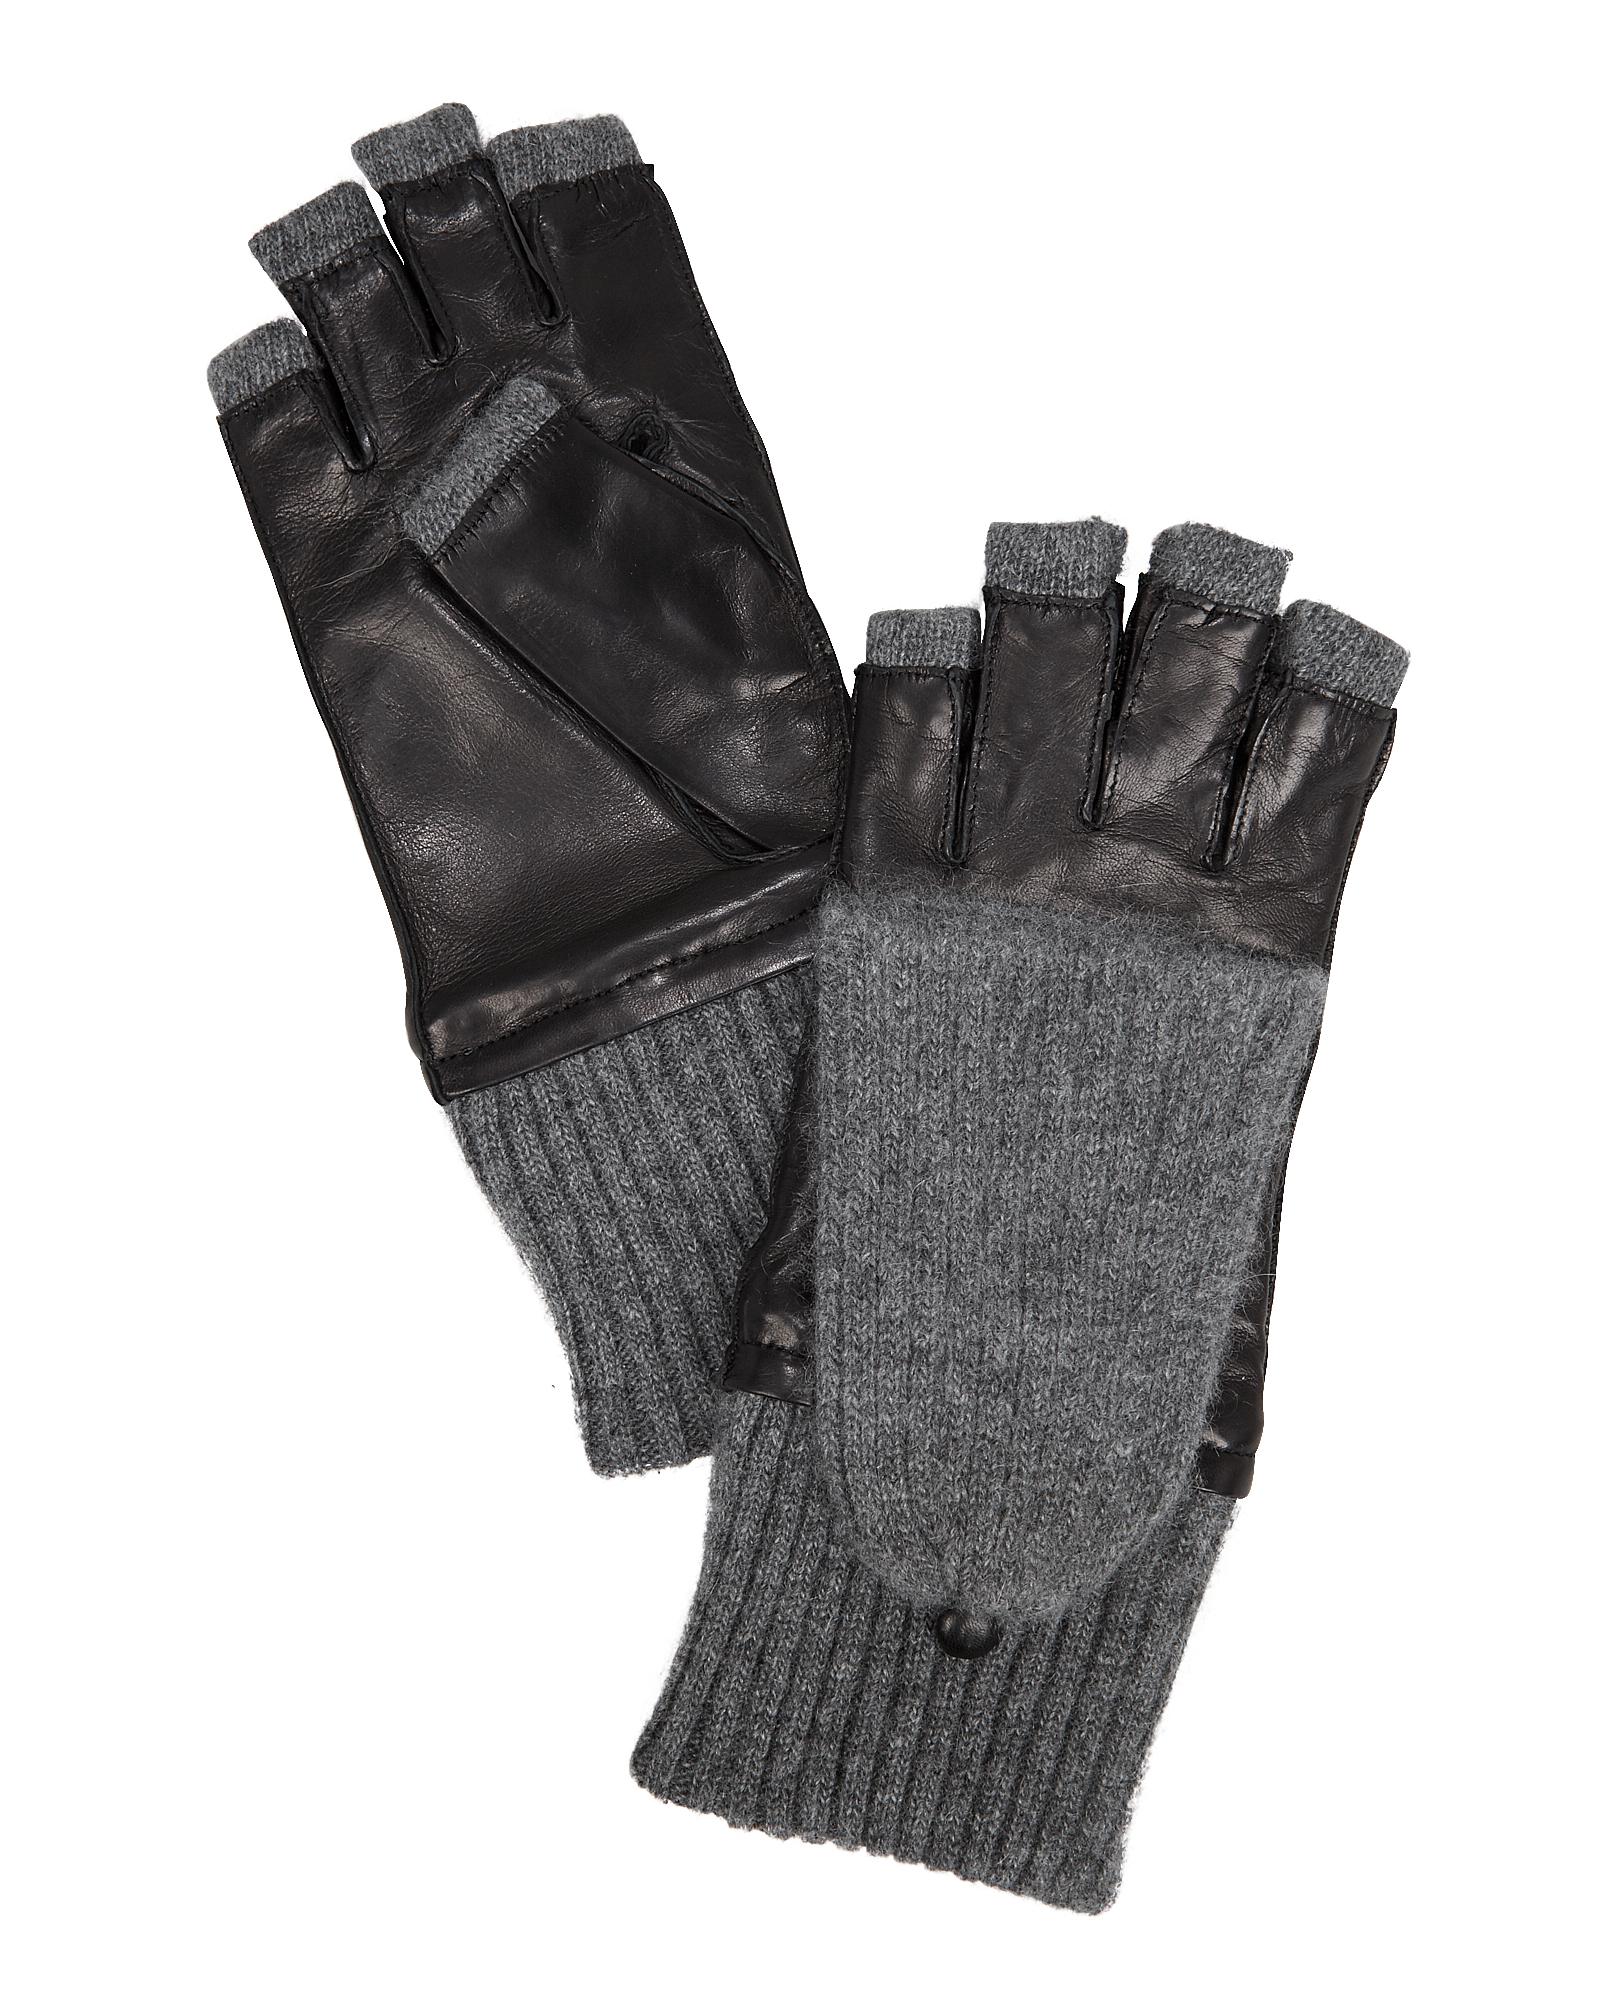 CAROLINA AMATO Pop Top Glove Black/Grey